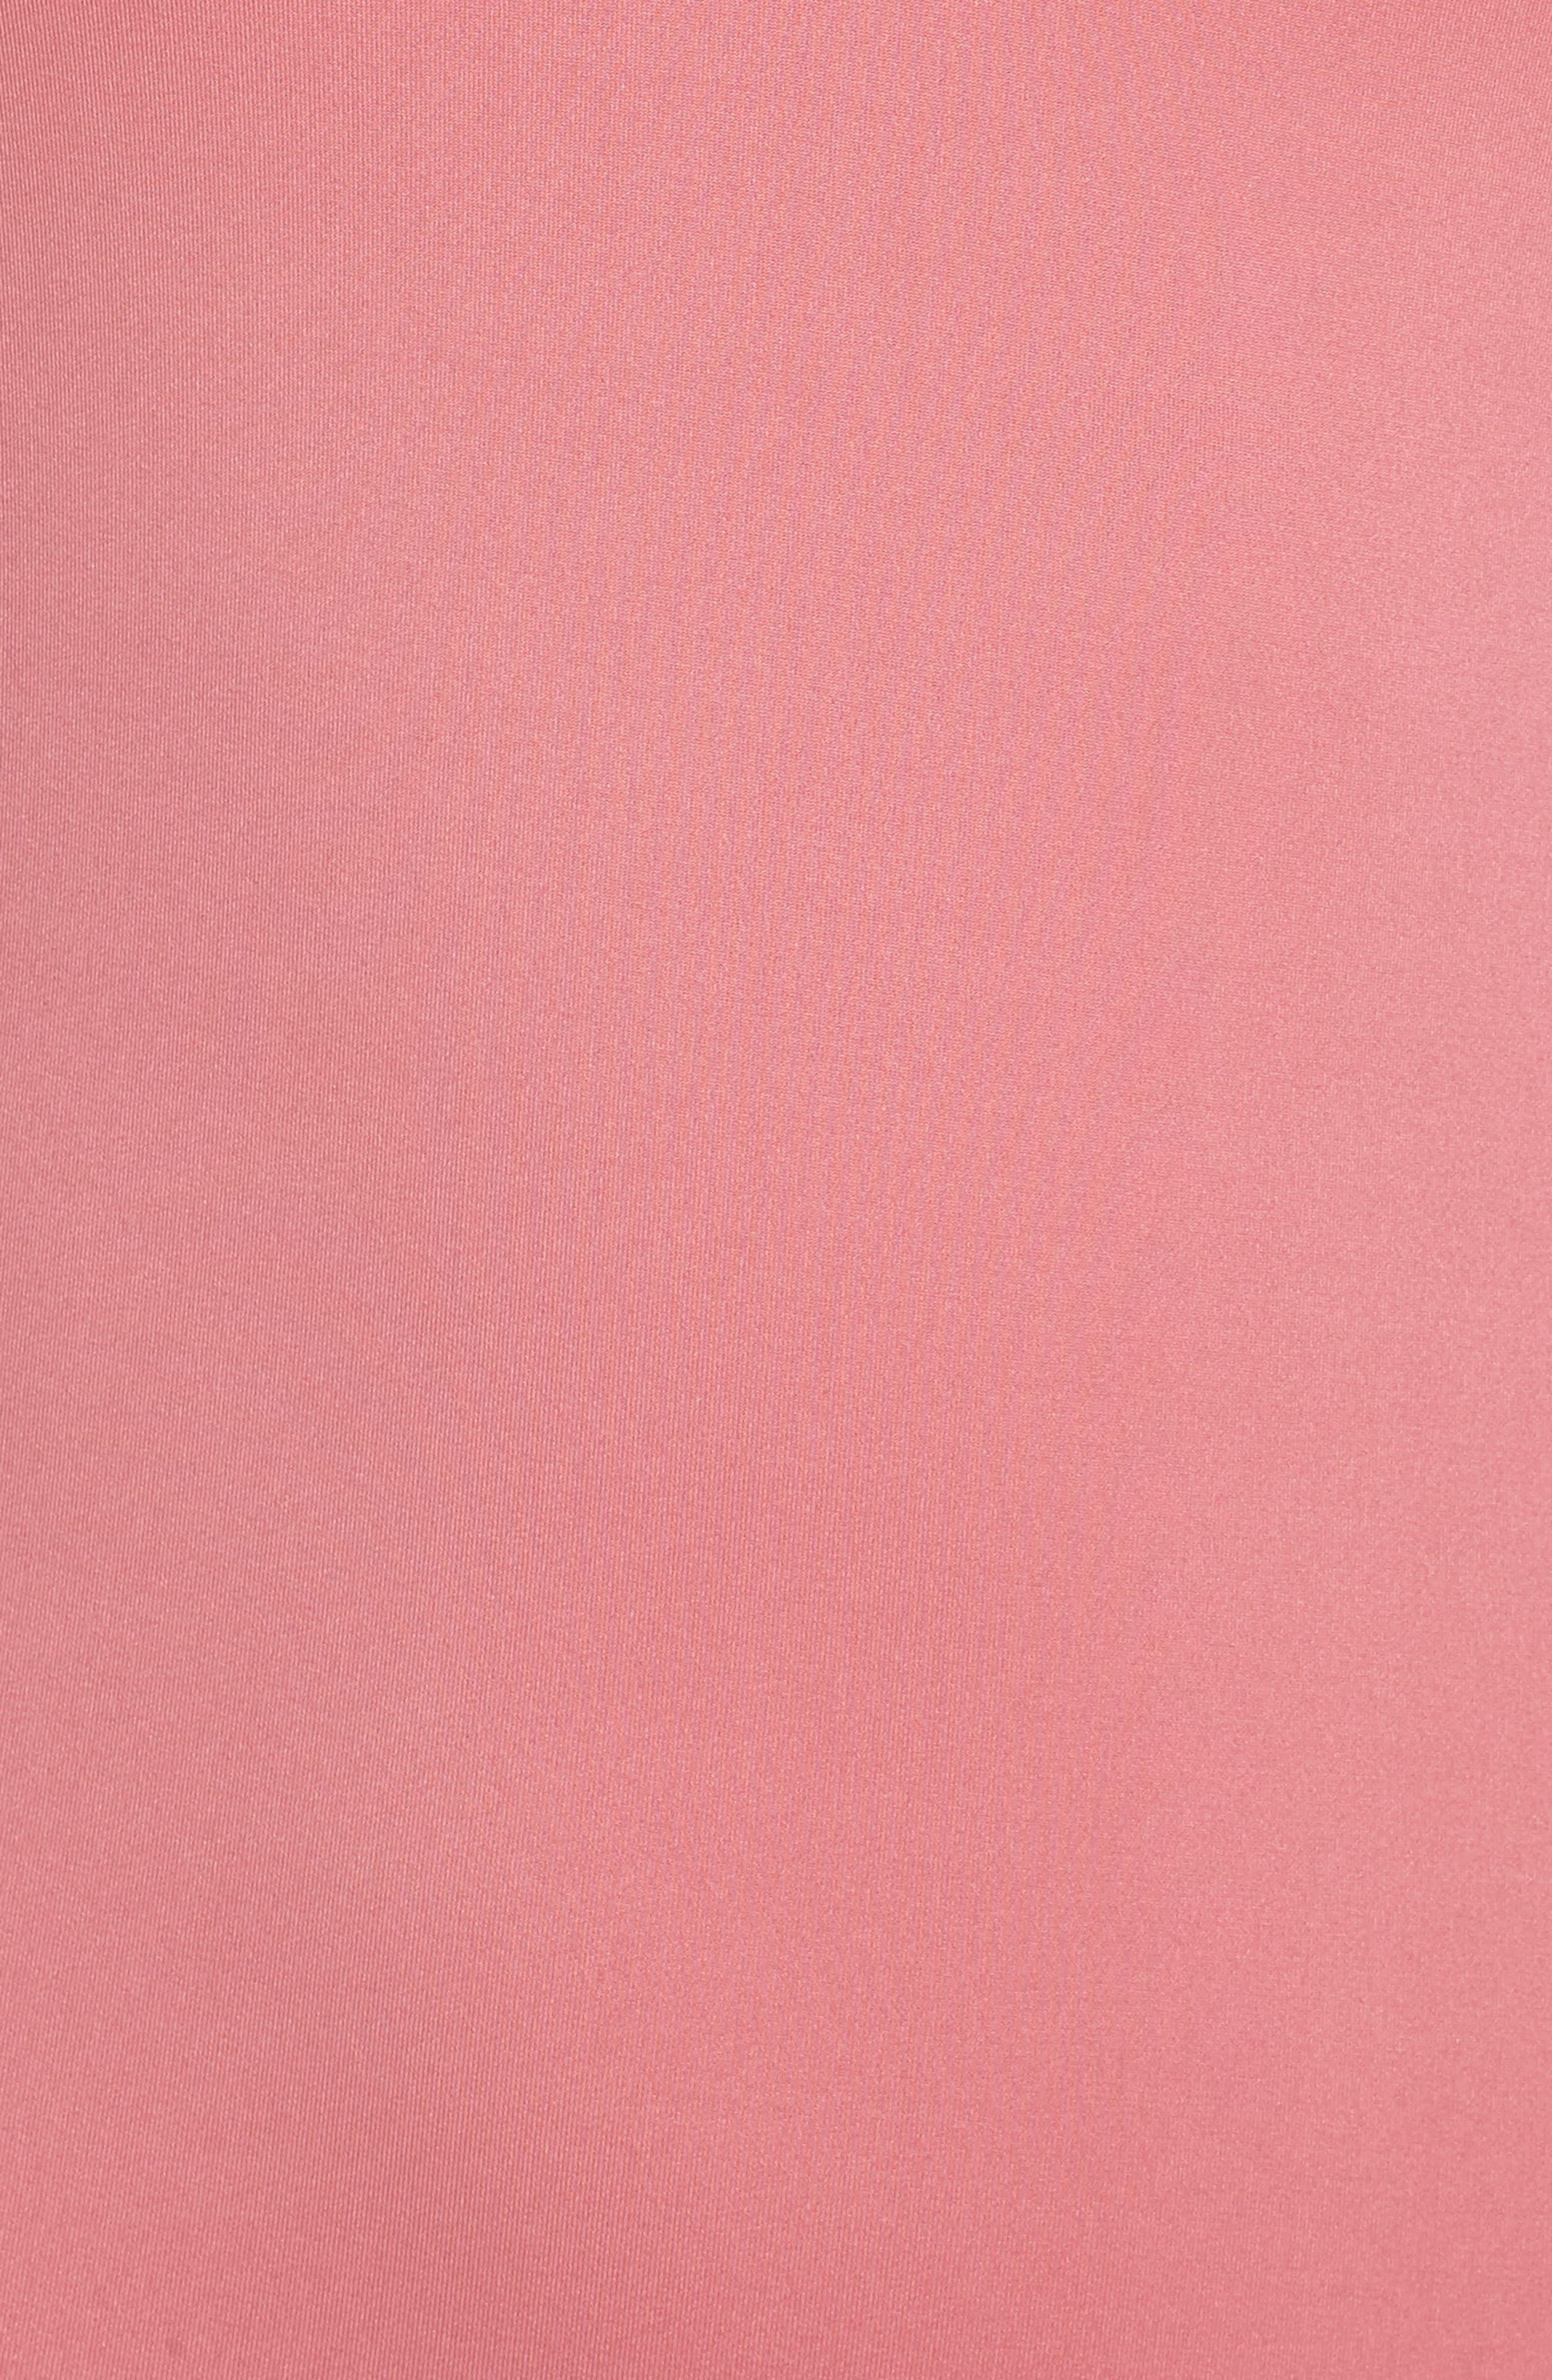 Cutout One-Piece Swimsuit,                             Alternate thumbnail 5, color,                             Dusty Rose